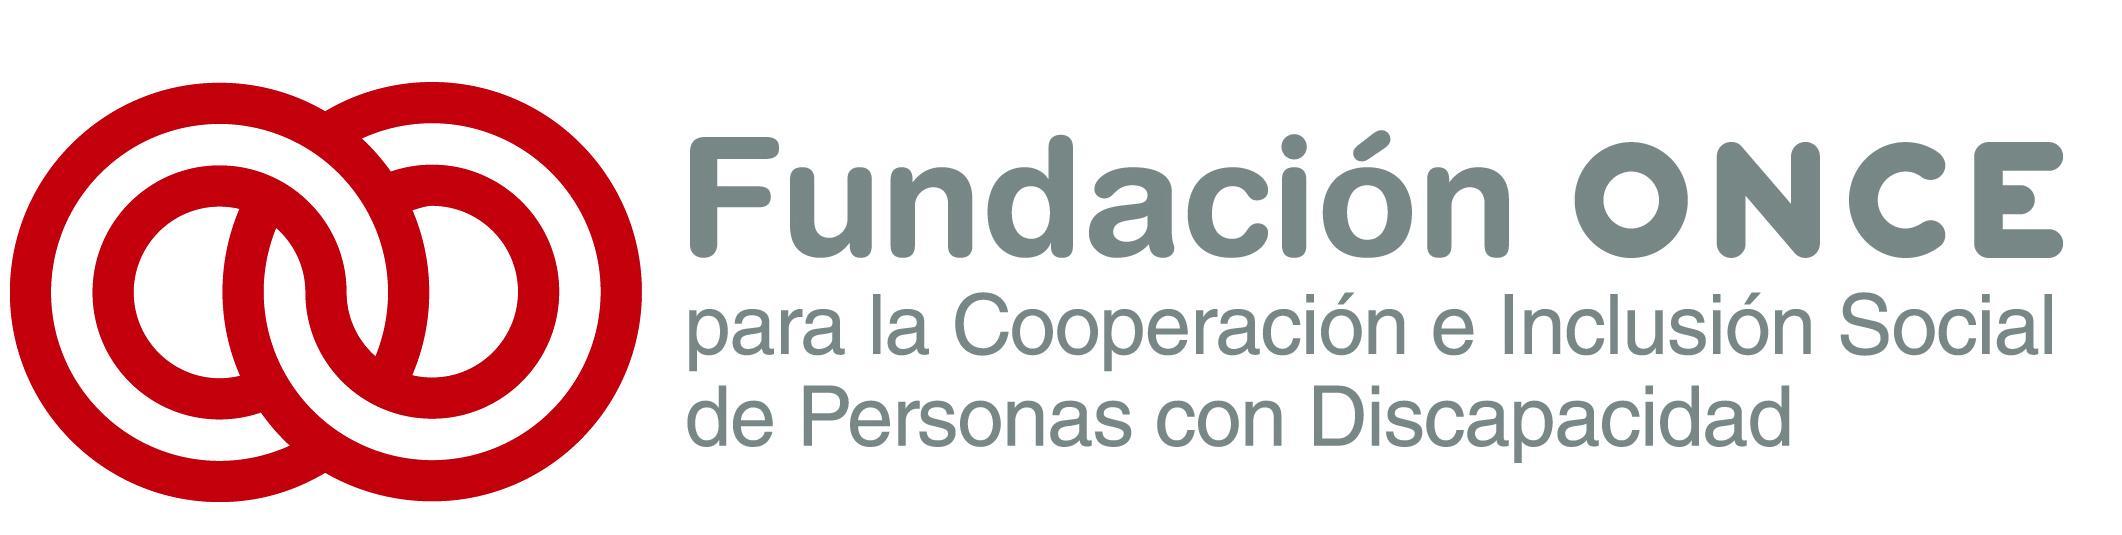 logo of Fundacion ONCE